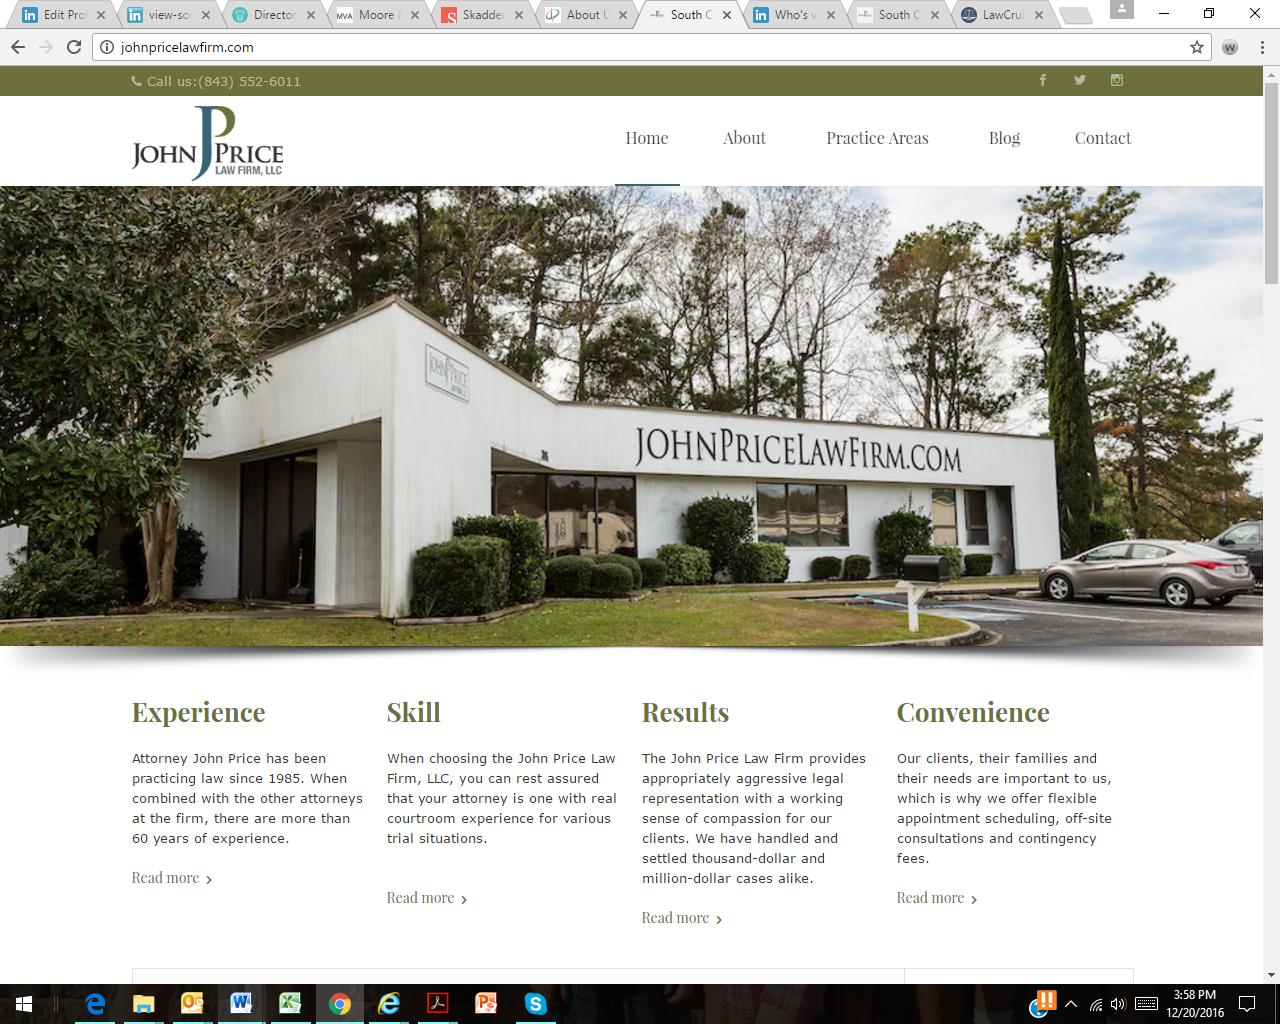 John Price Law Firm